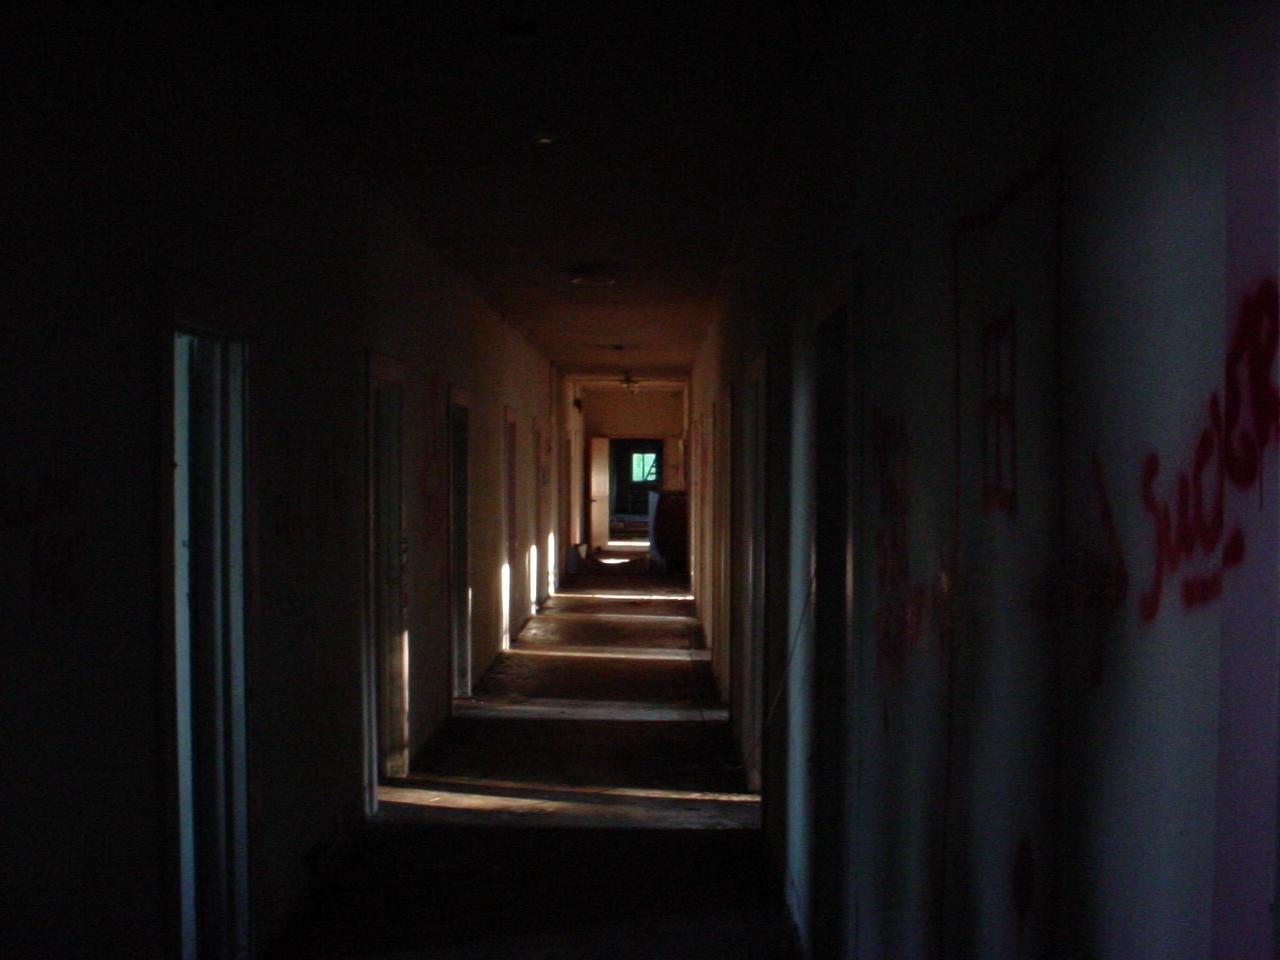 Dark House Hallways | www.pixshark.com - Images Galleries ...